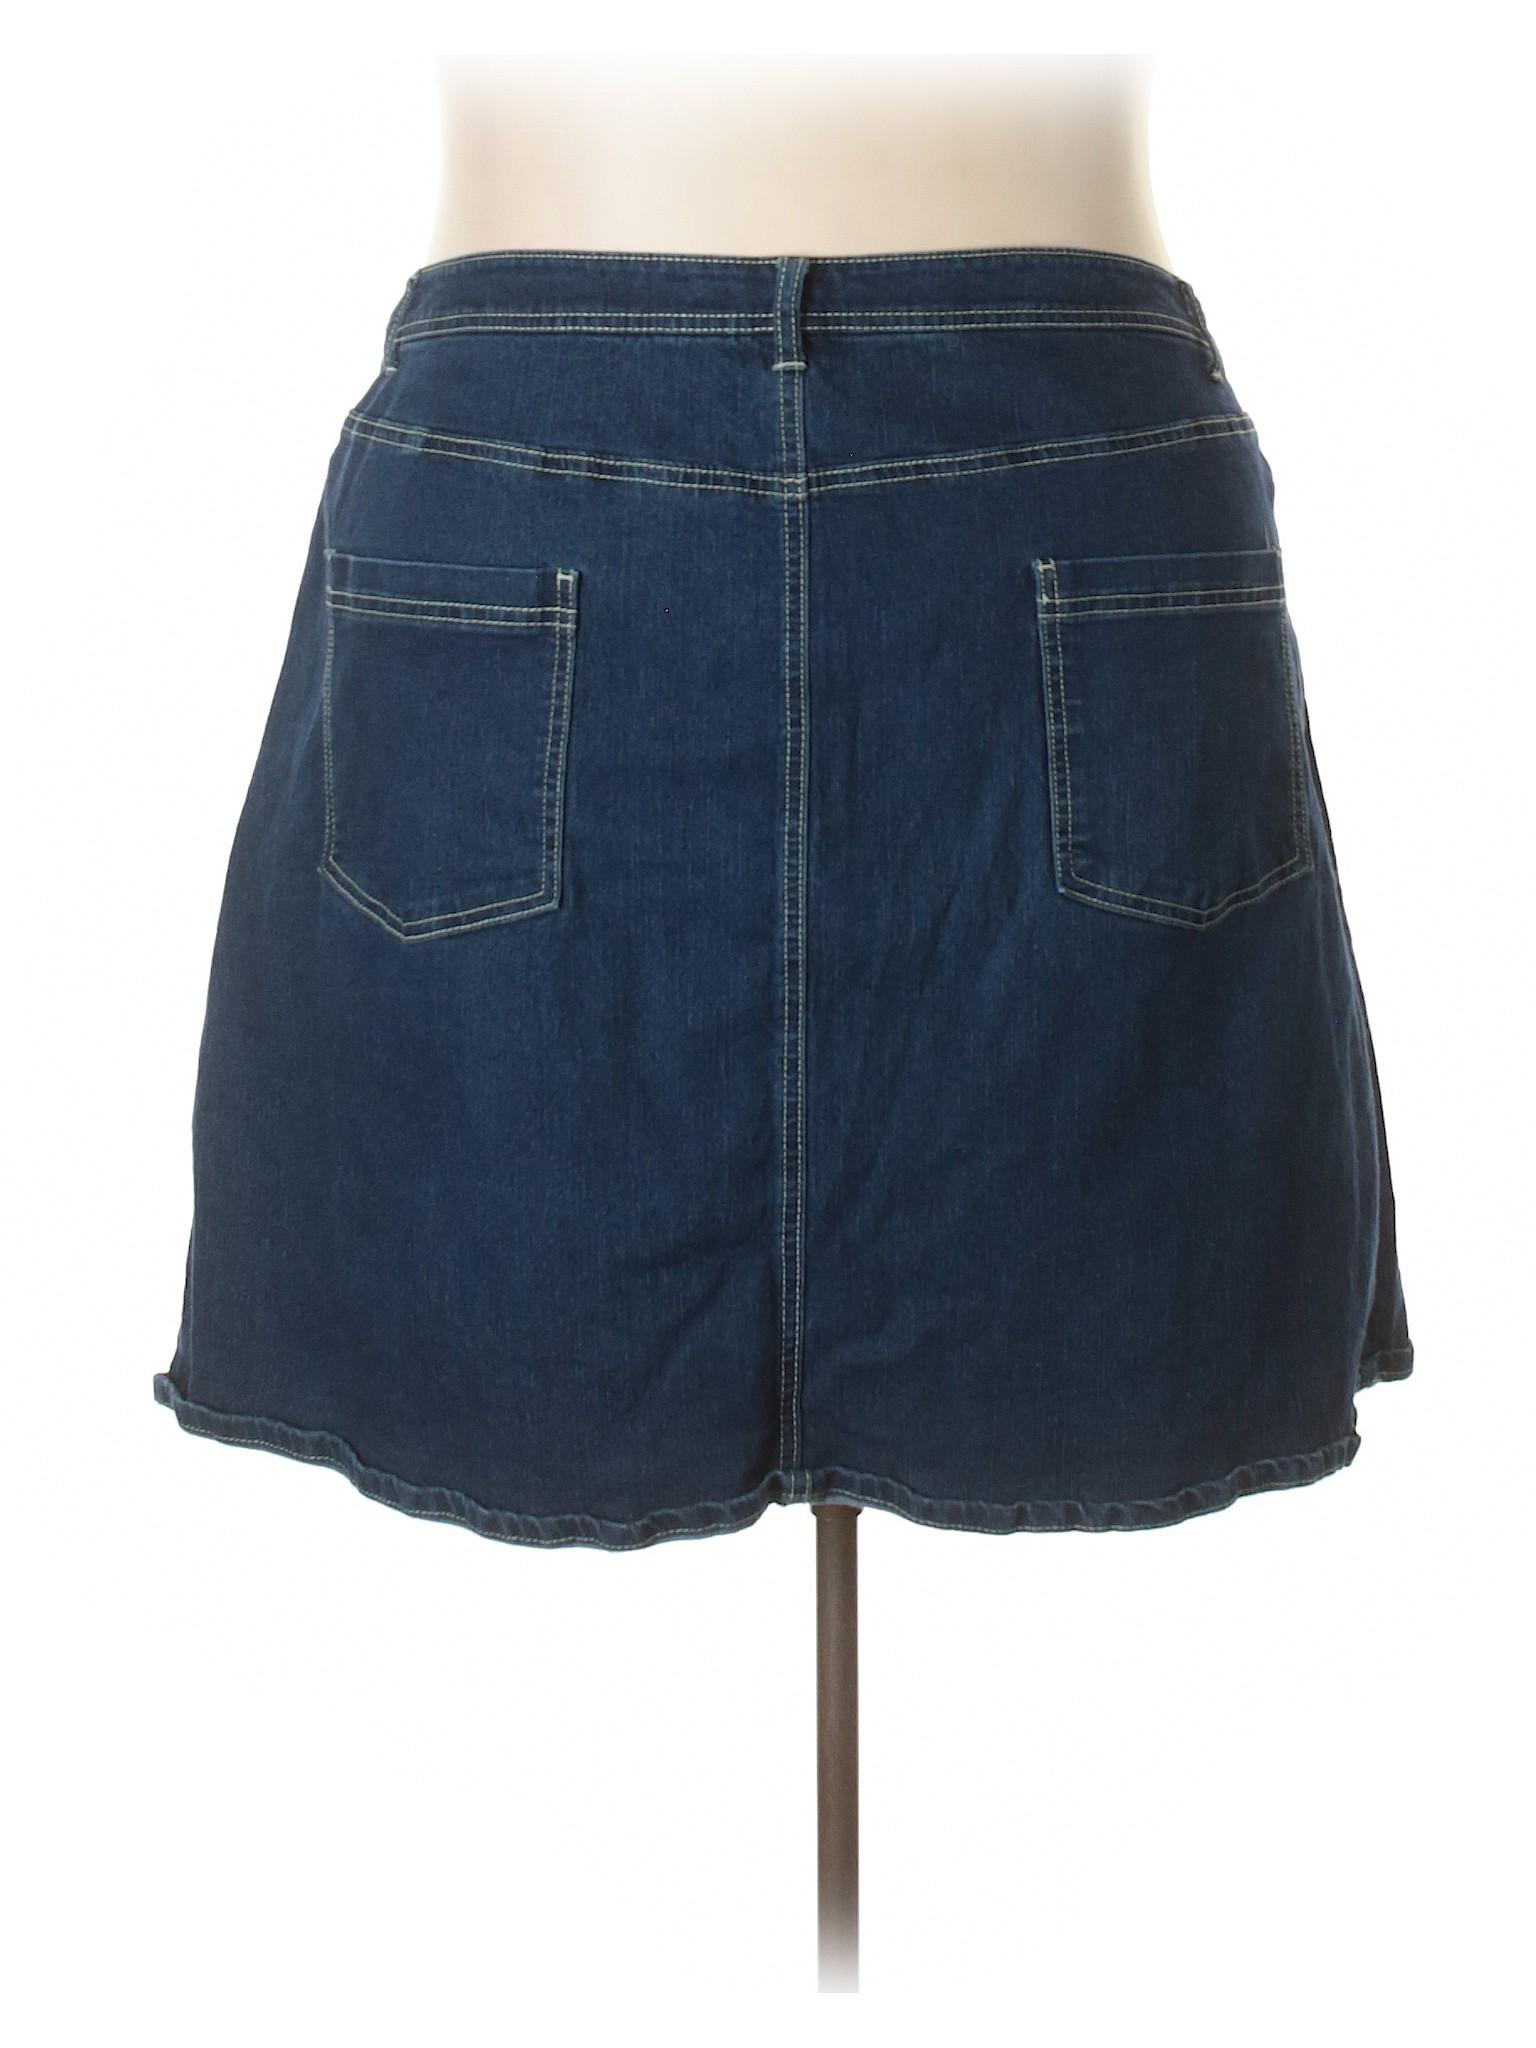 Skirt Denim Denim Boutique Boutique Denim Skirt Skirt Boutique fTwHWdq